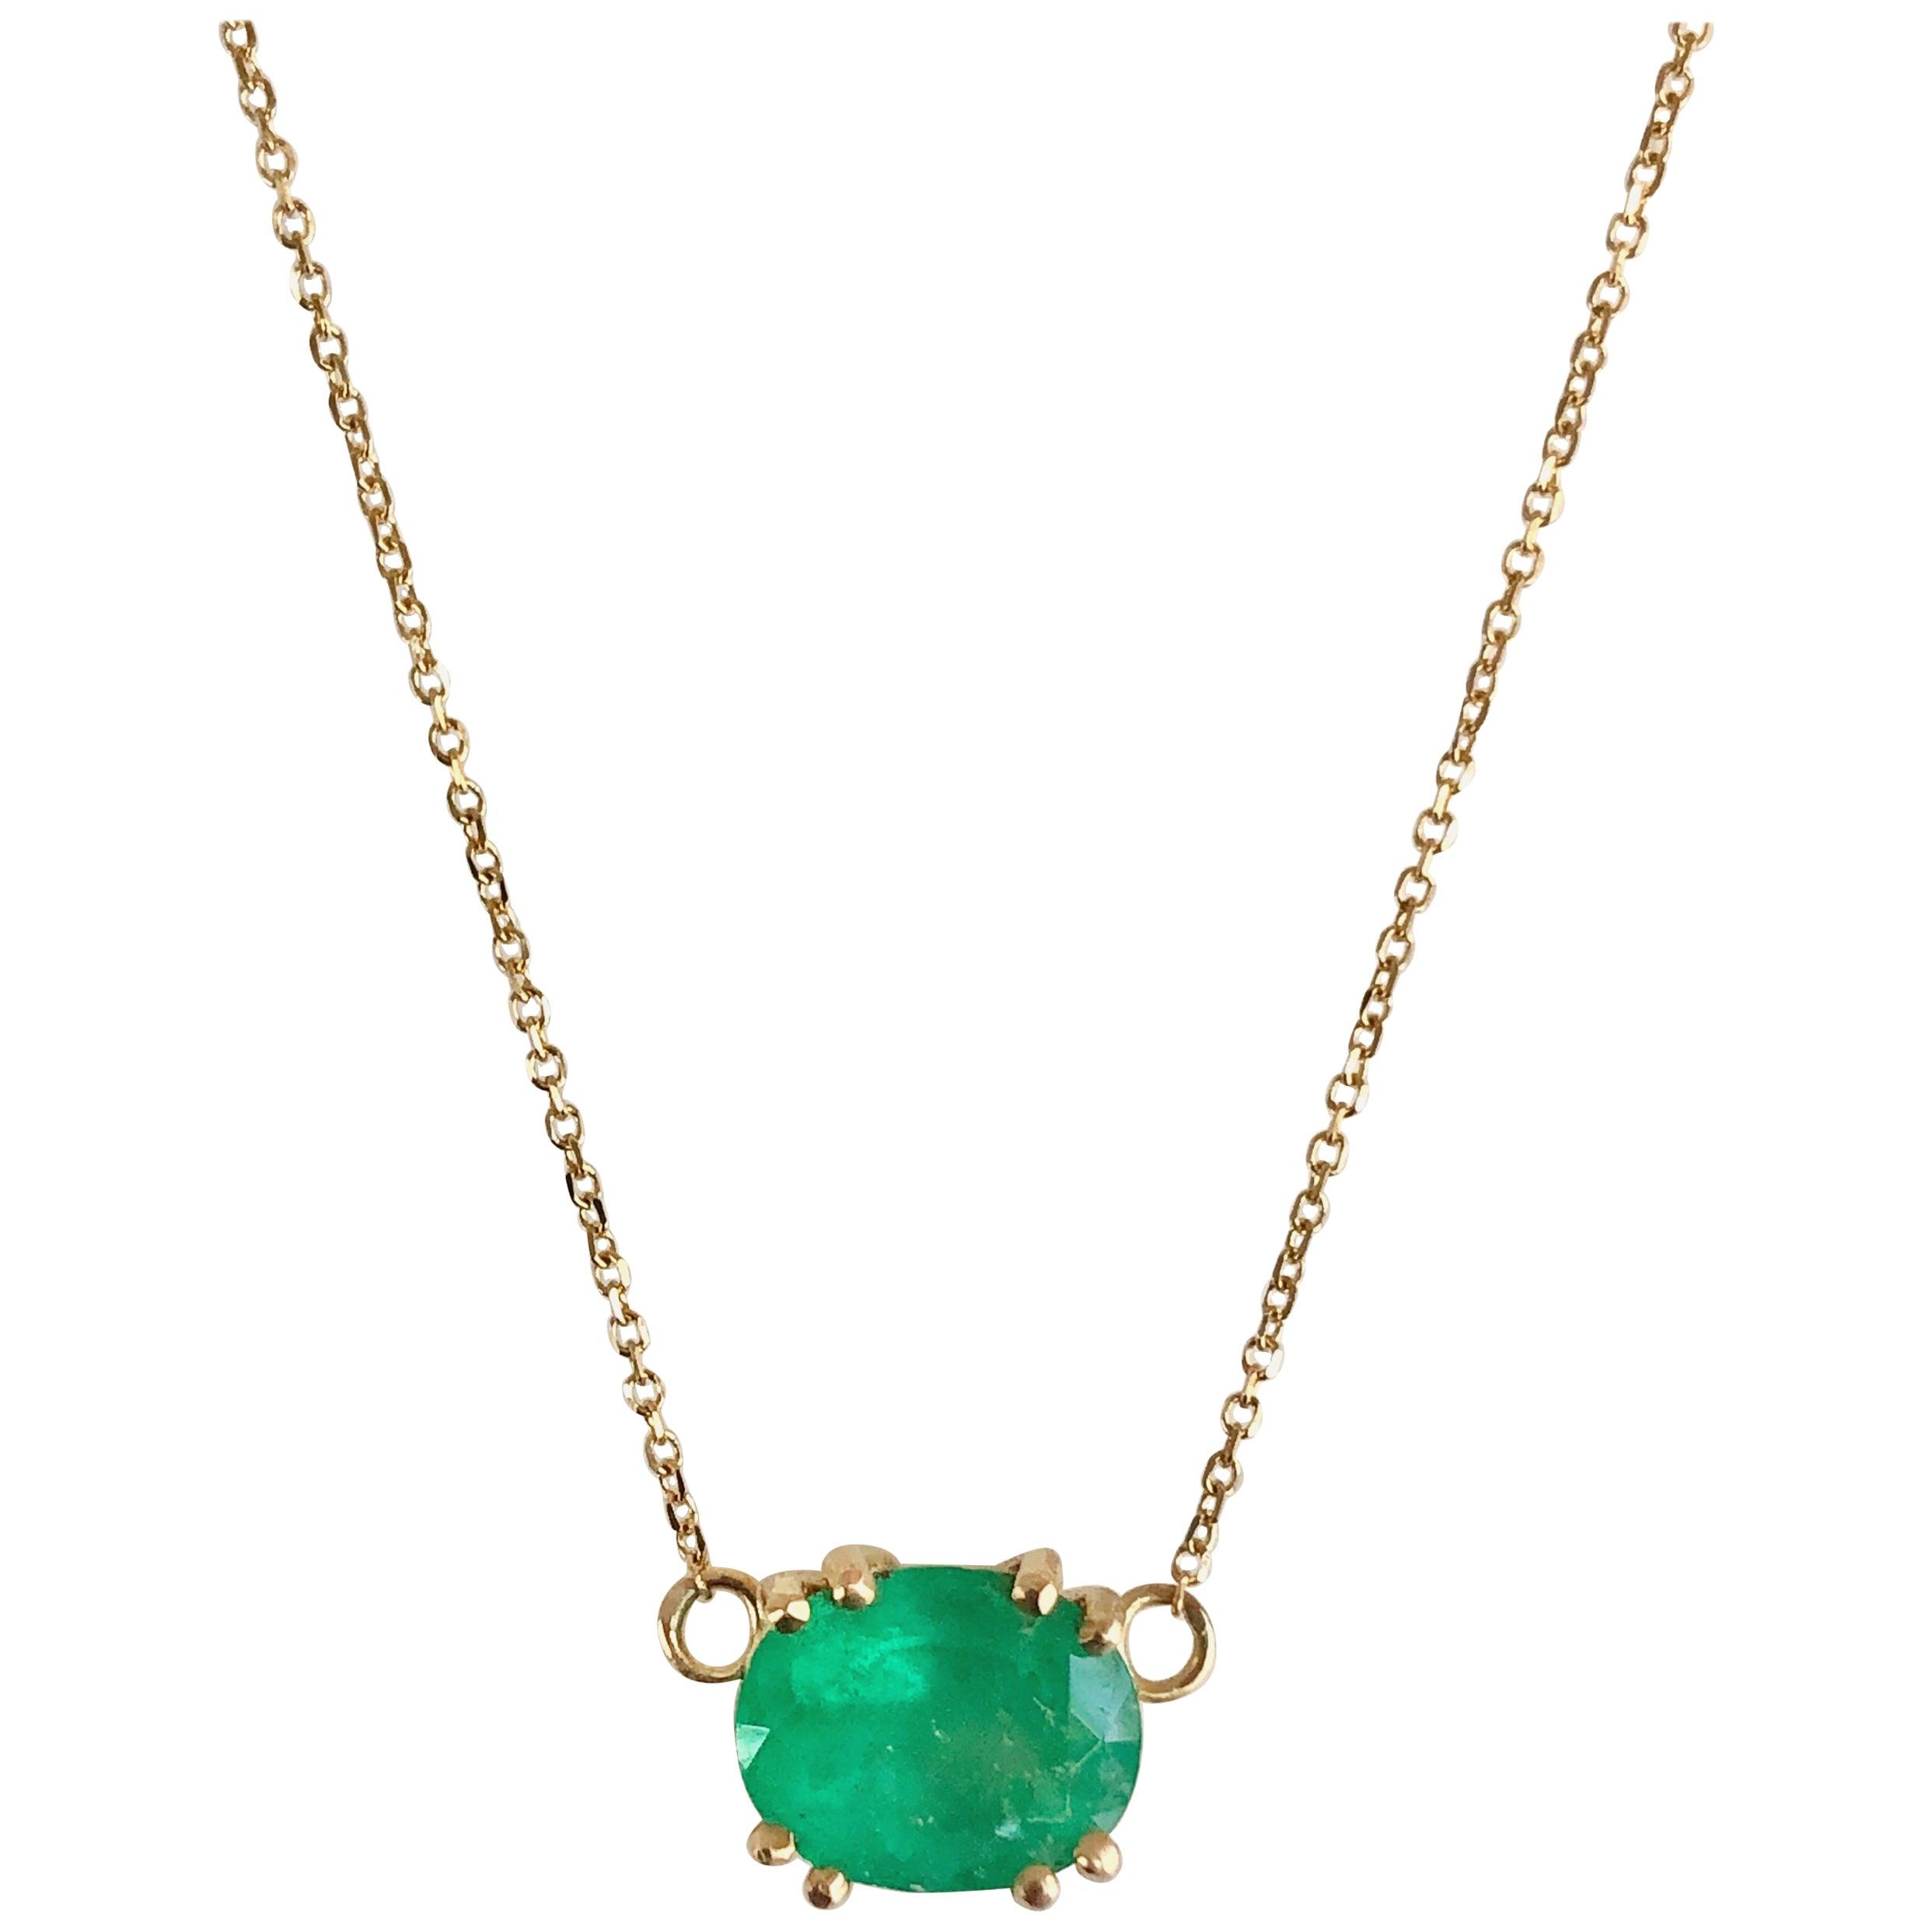 Pendant Necklace Oval Natural Emerald 18 Karat